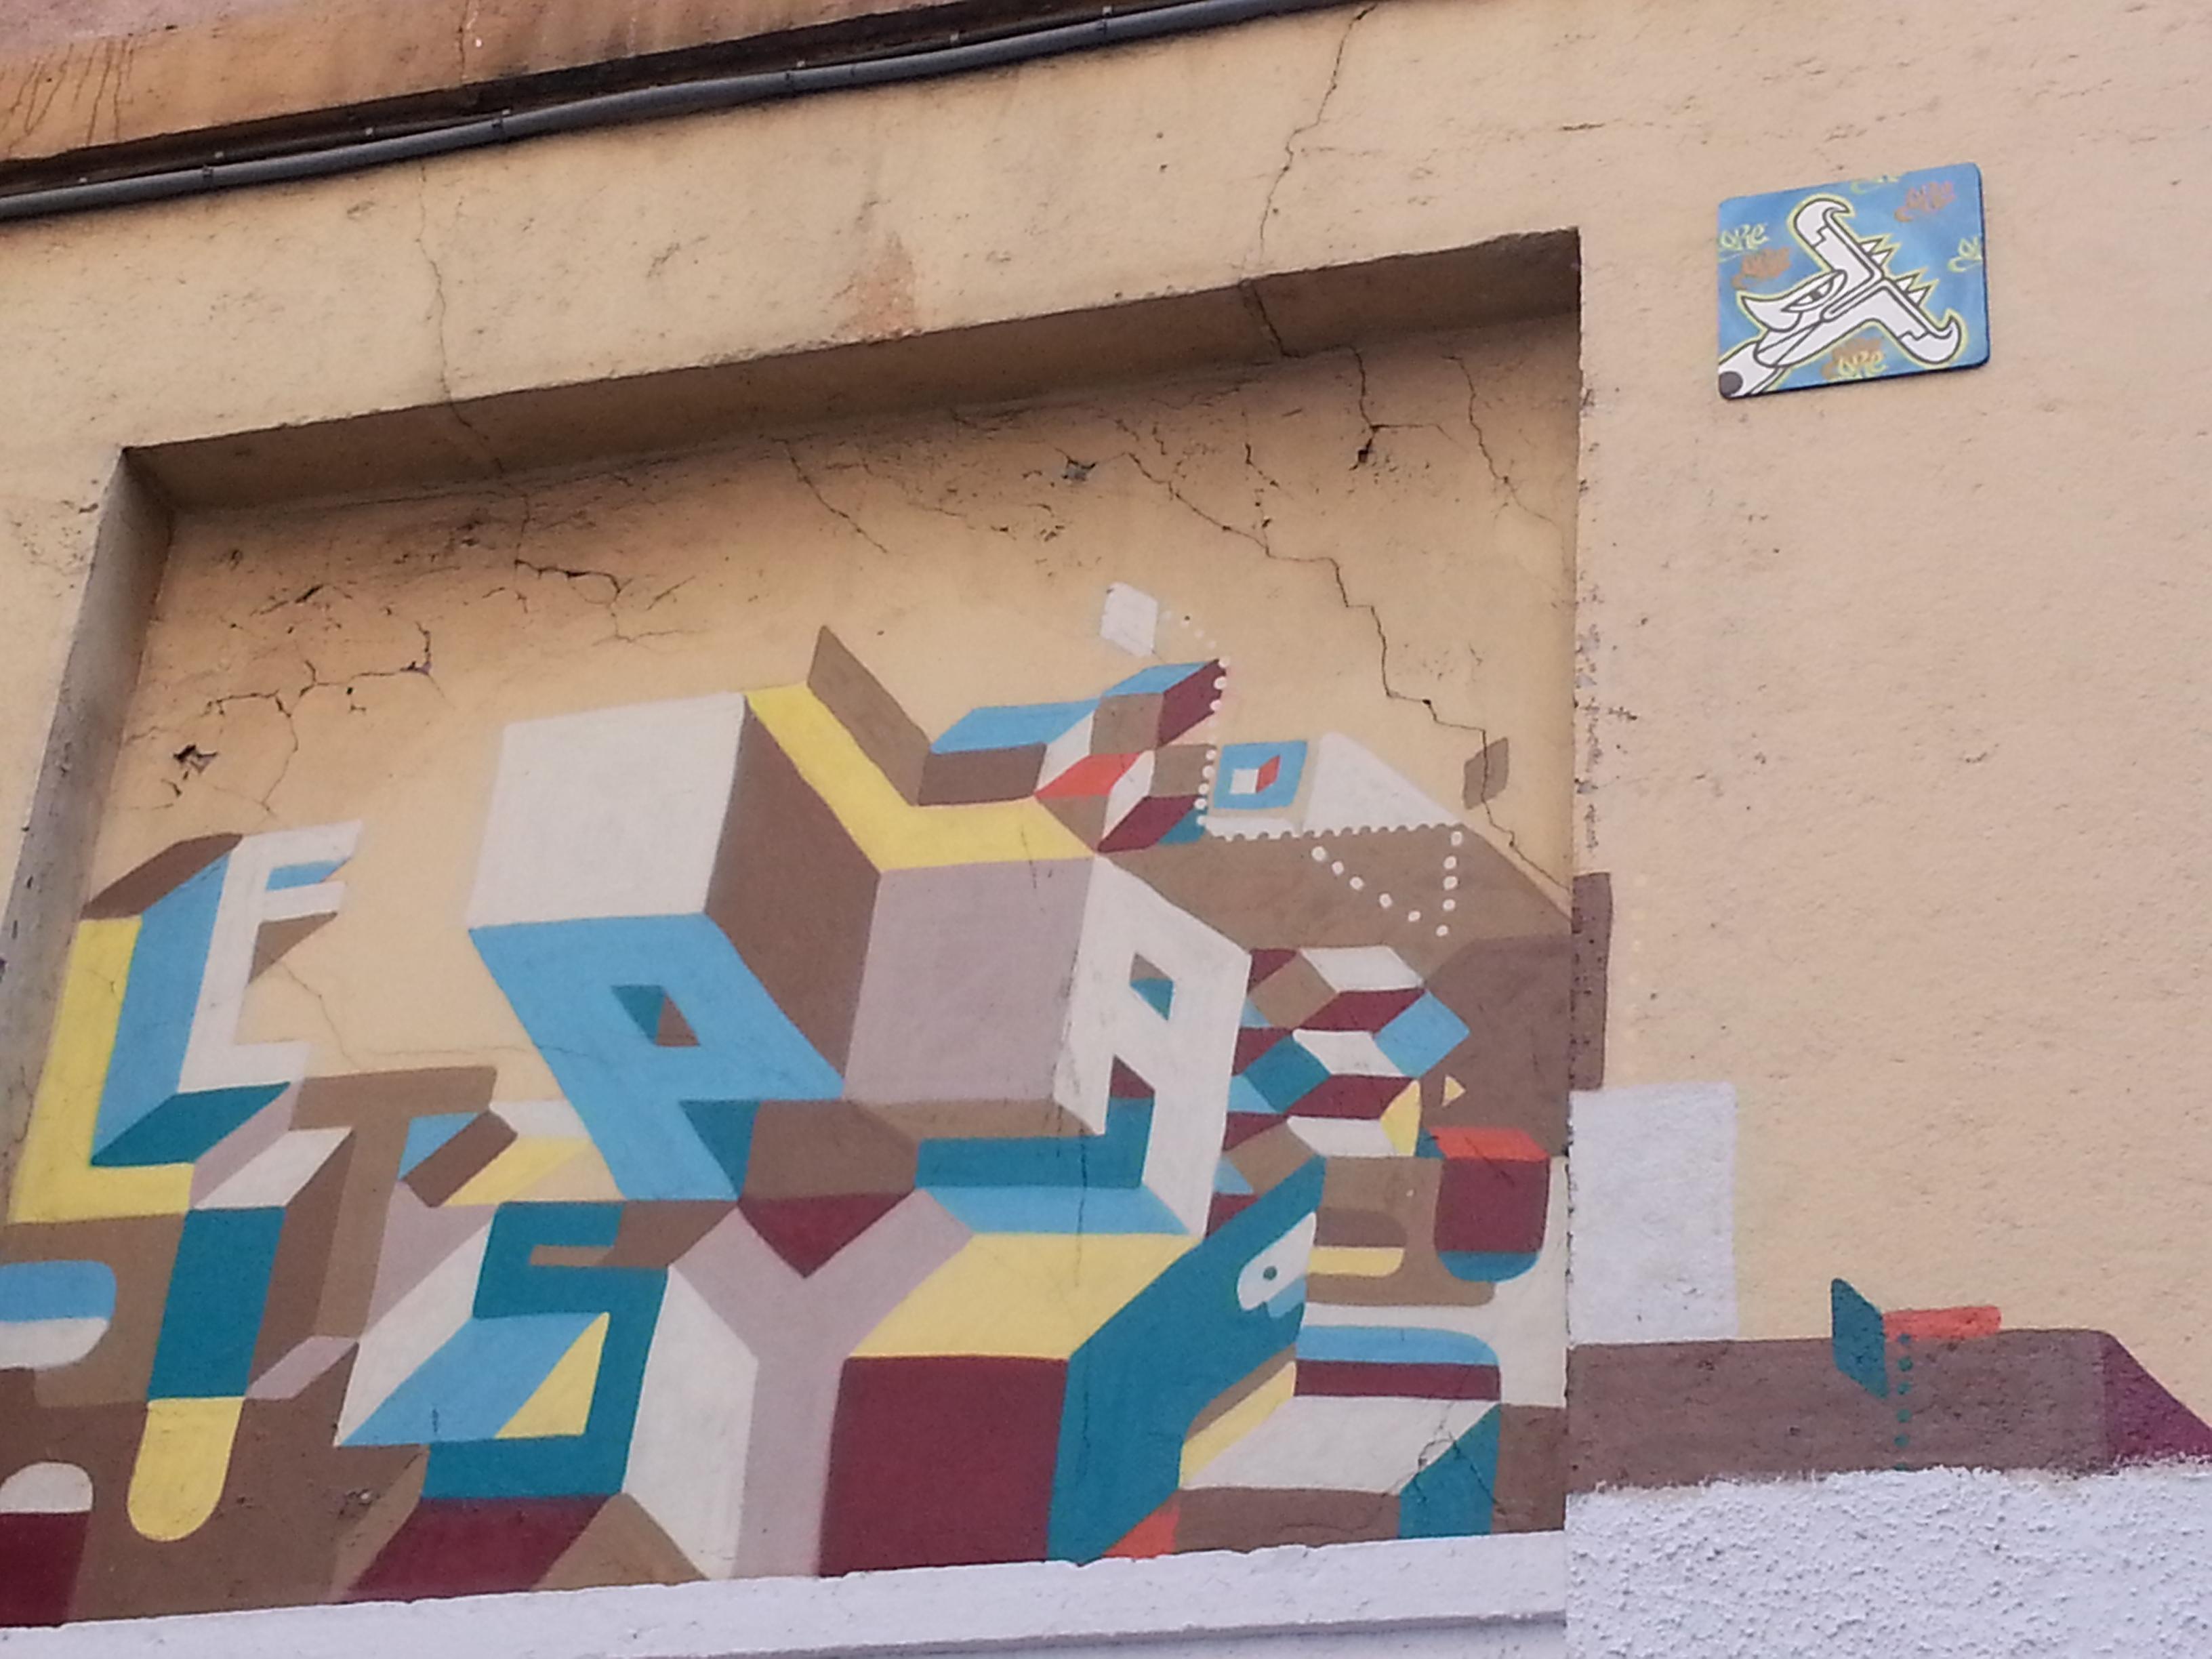 street art pentes croix rousse lyon 24